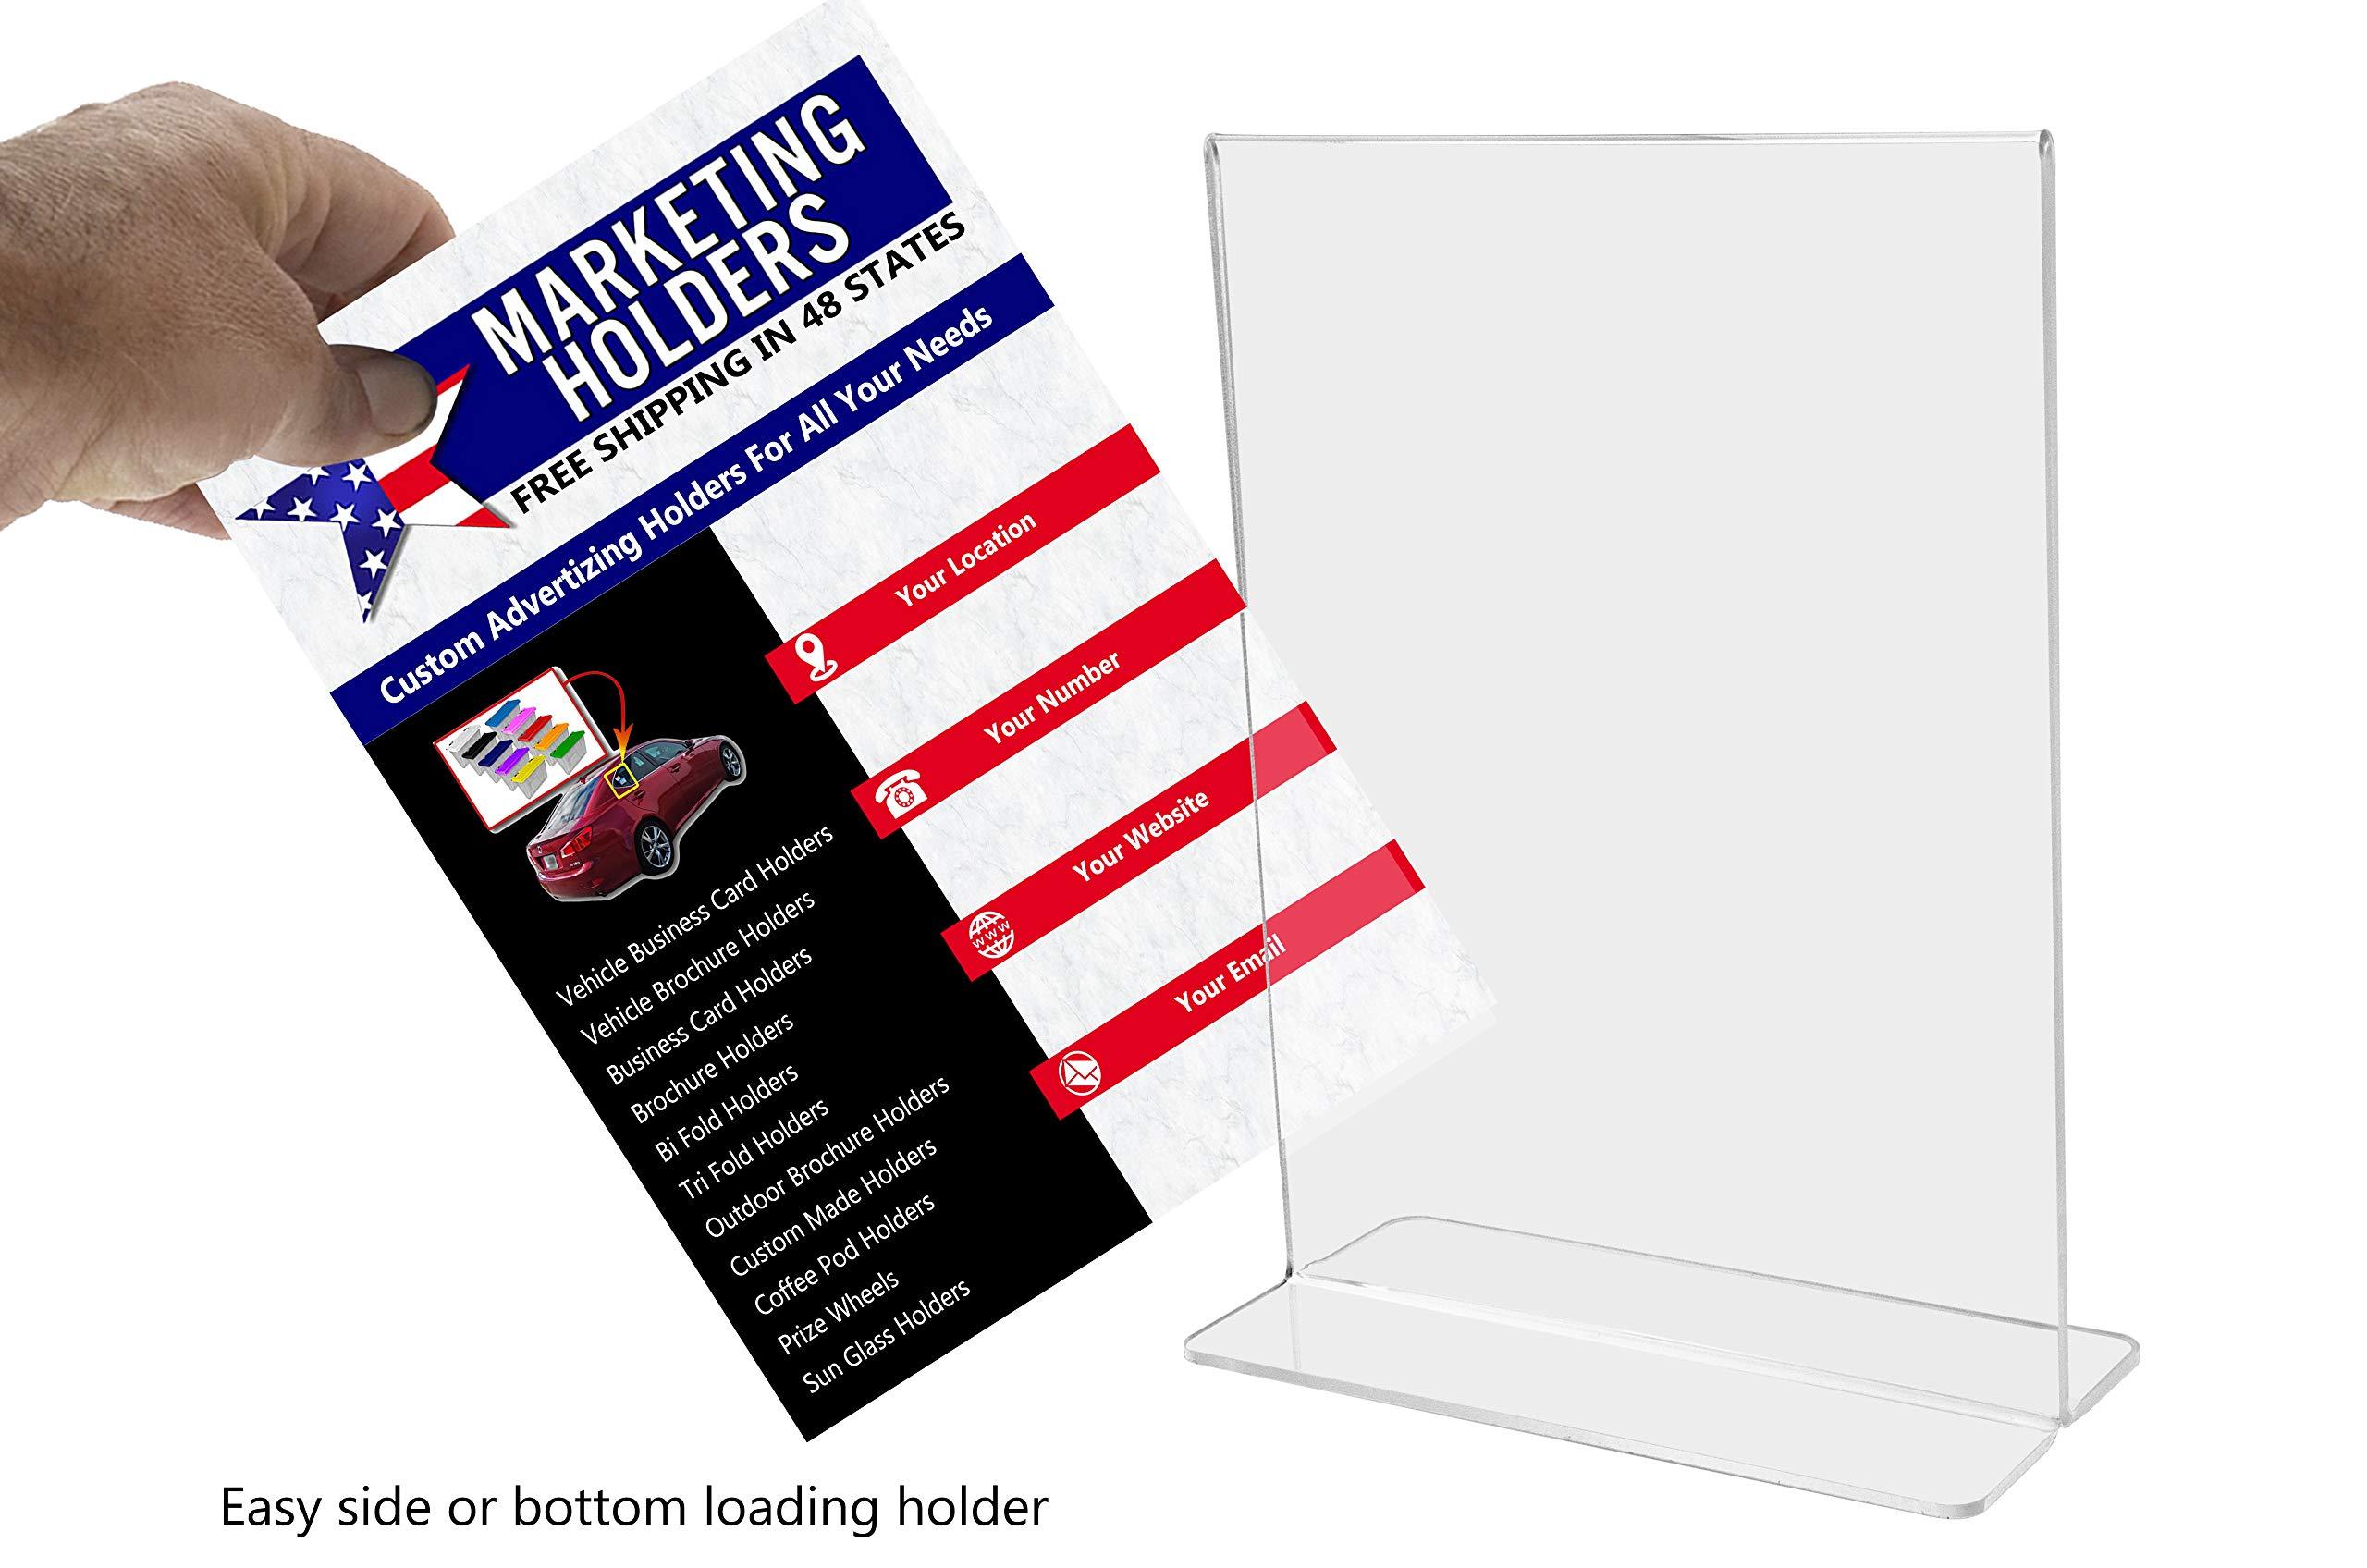 Marketing Holders Sign Holder Literture Flyer Display Stand Bottom Load Frames 11''w x 14''h Pack of 10 by Marketing Holders (Image #4)